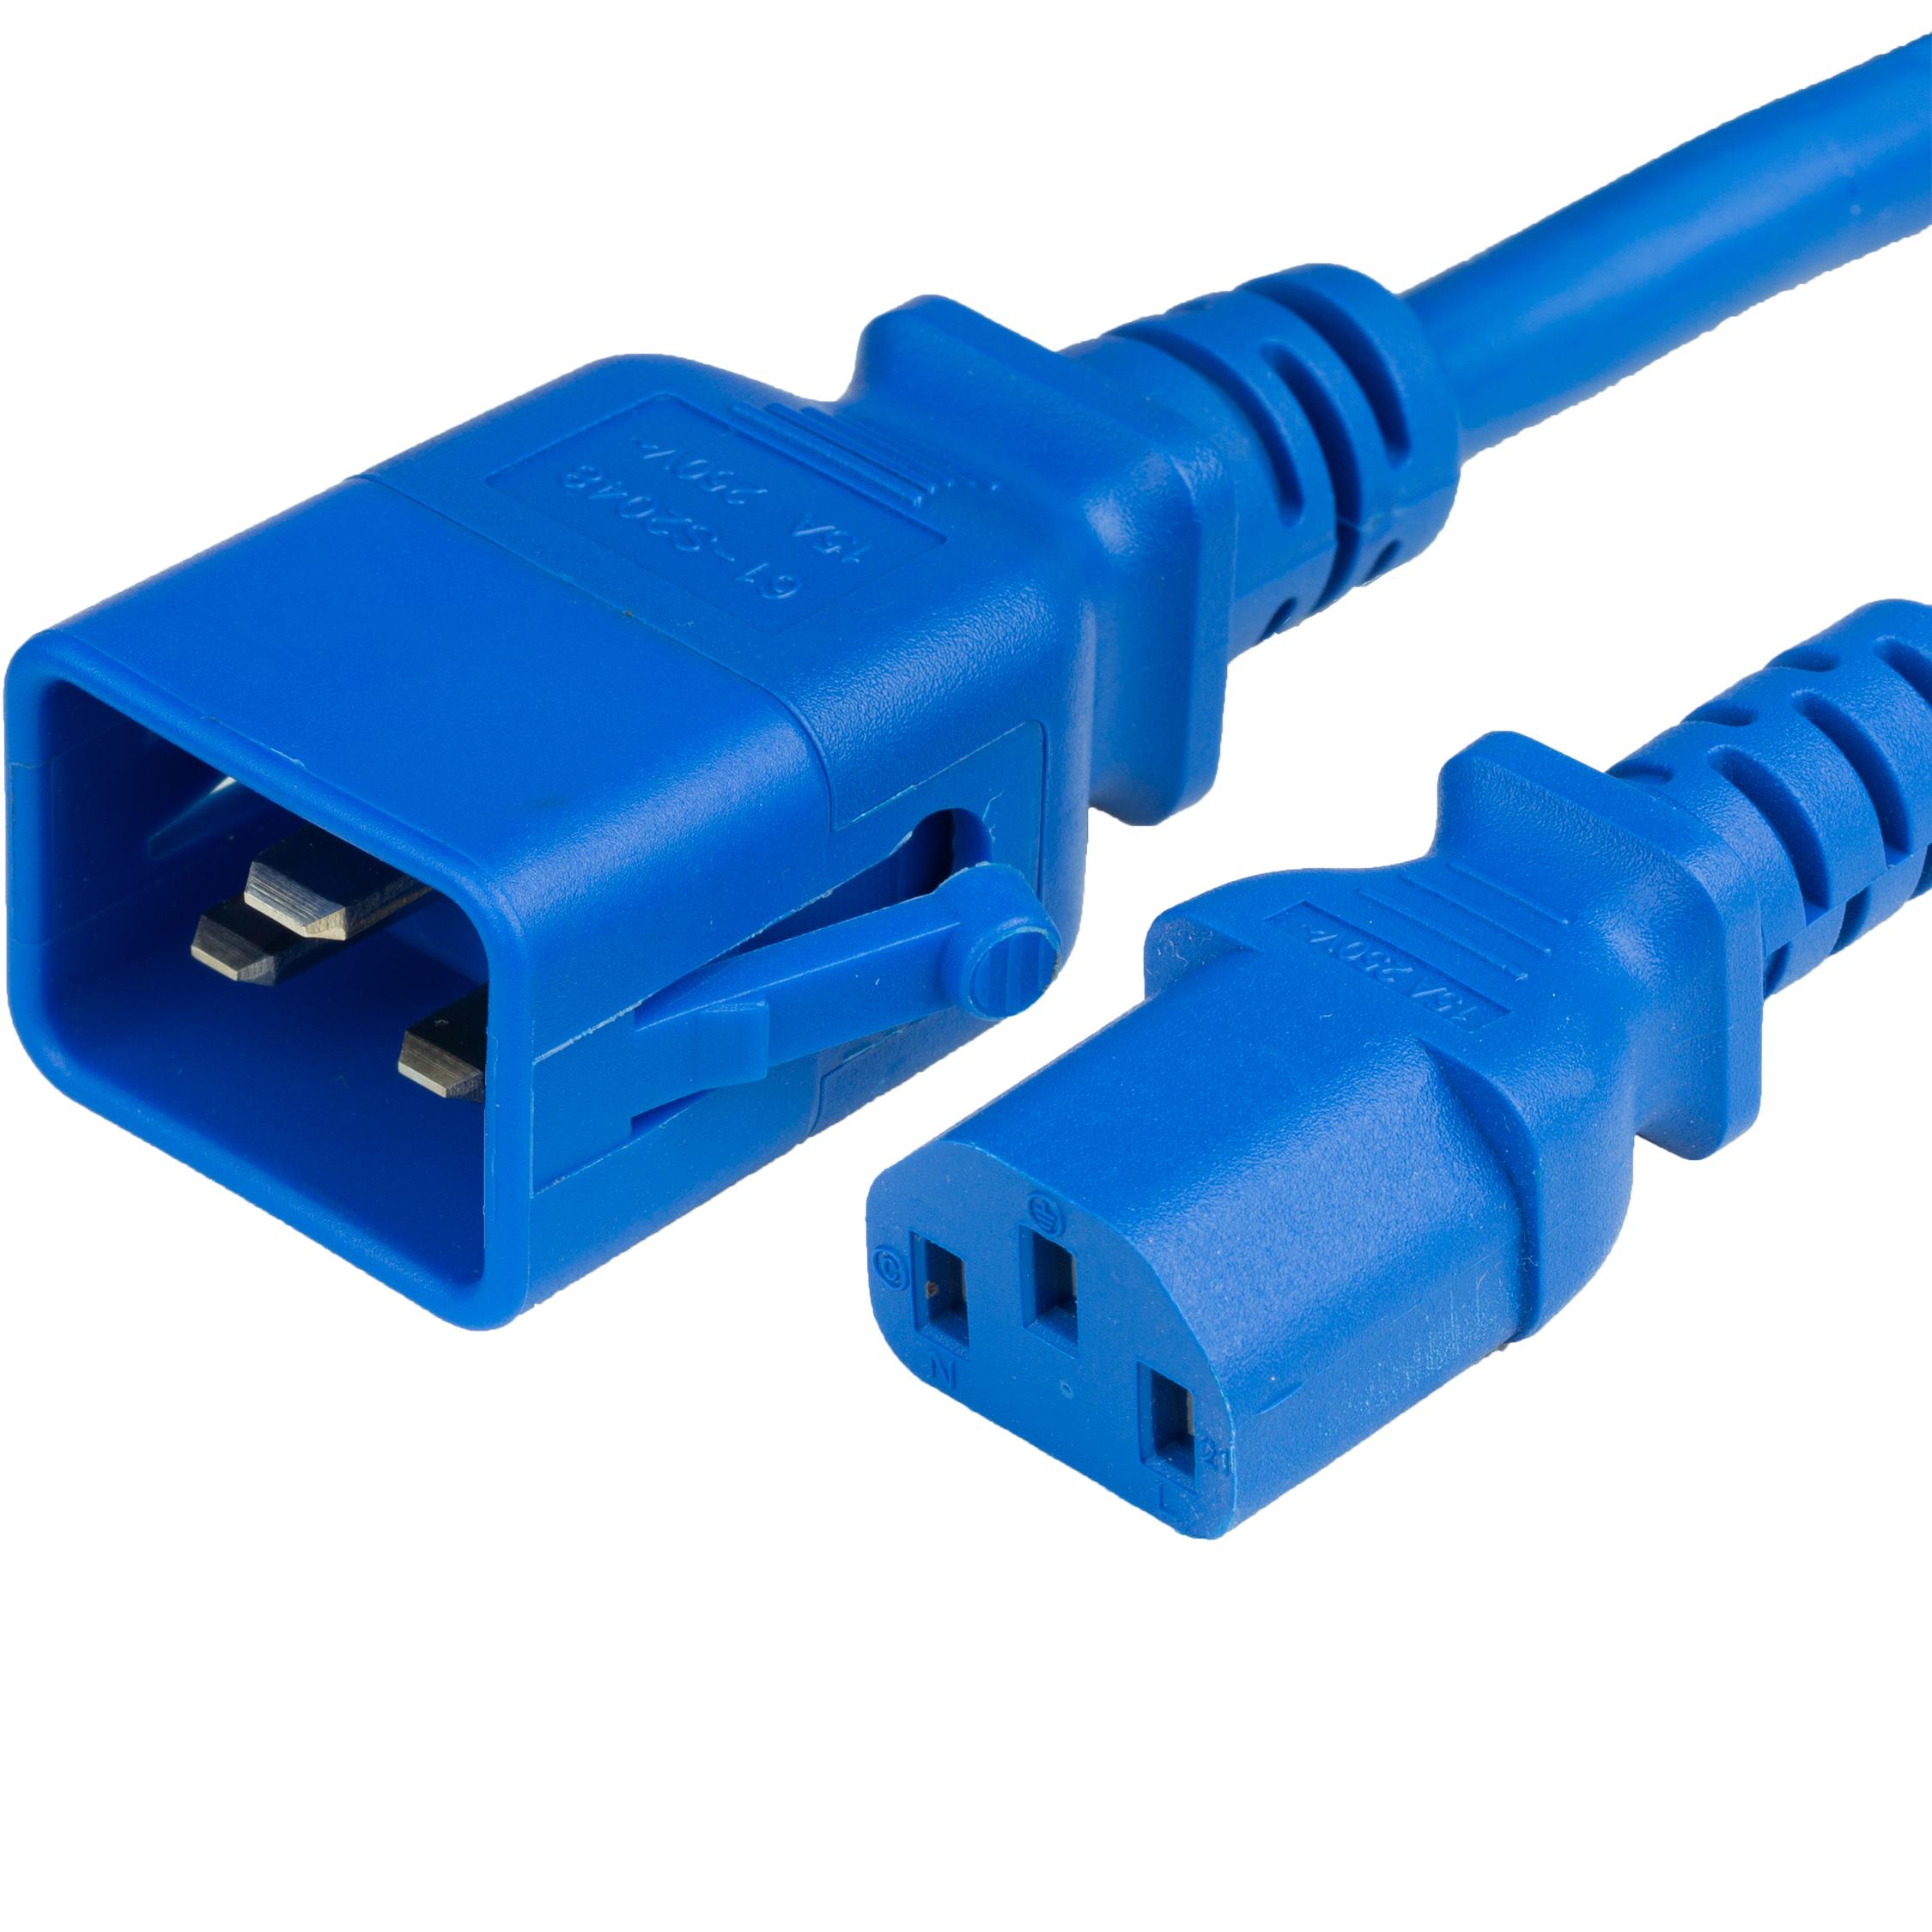 3FT P-LOCK C20 to C13 14awg SJT 105c 15A 250V BLUE Power Cord